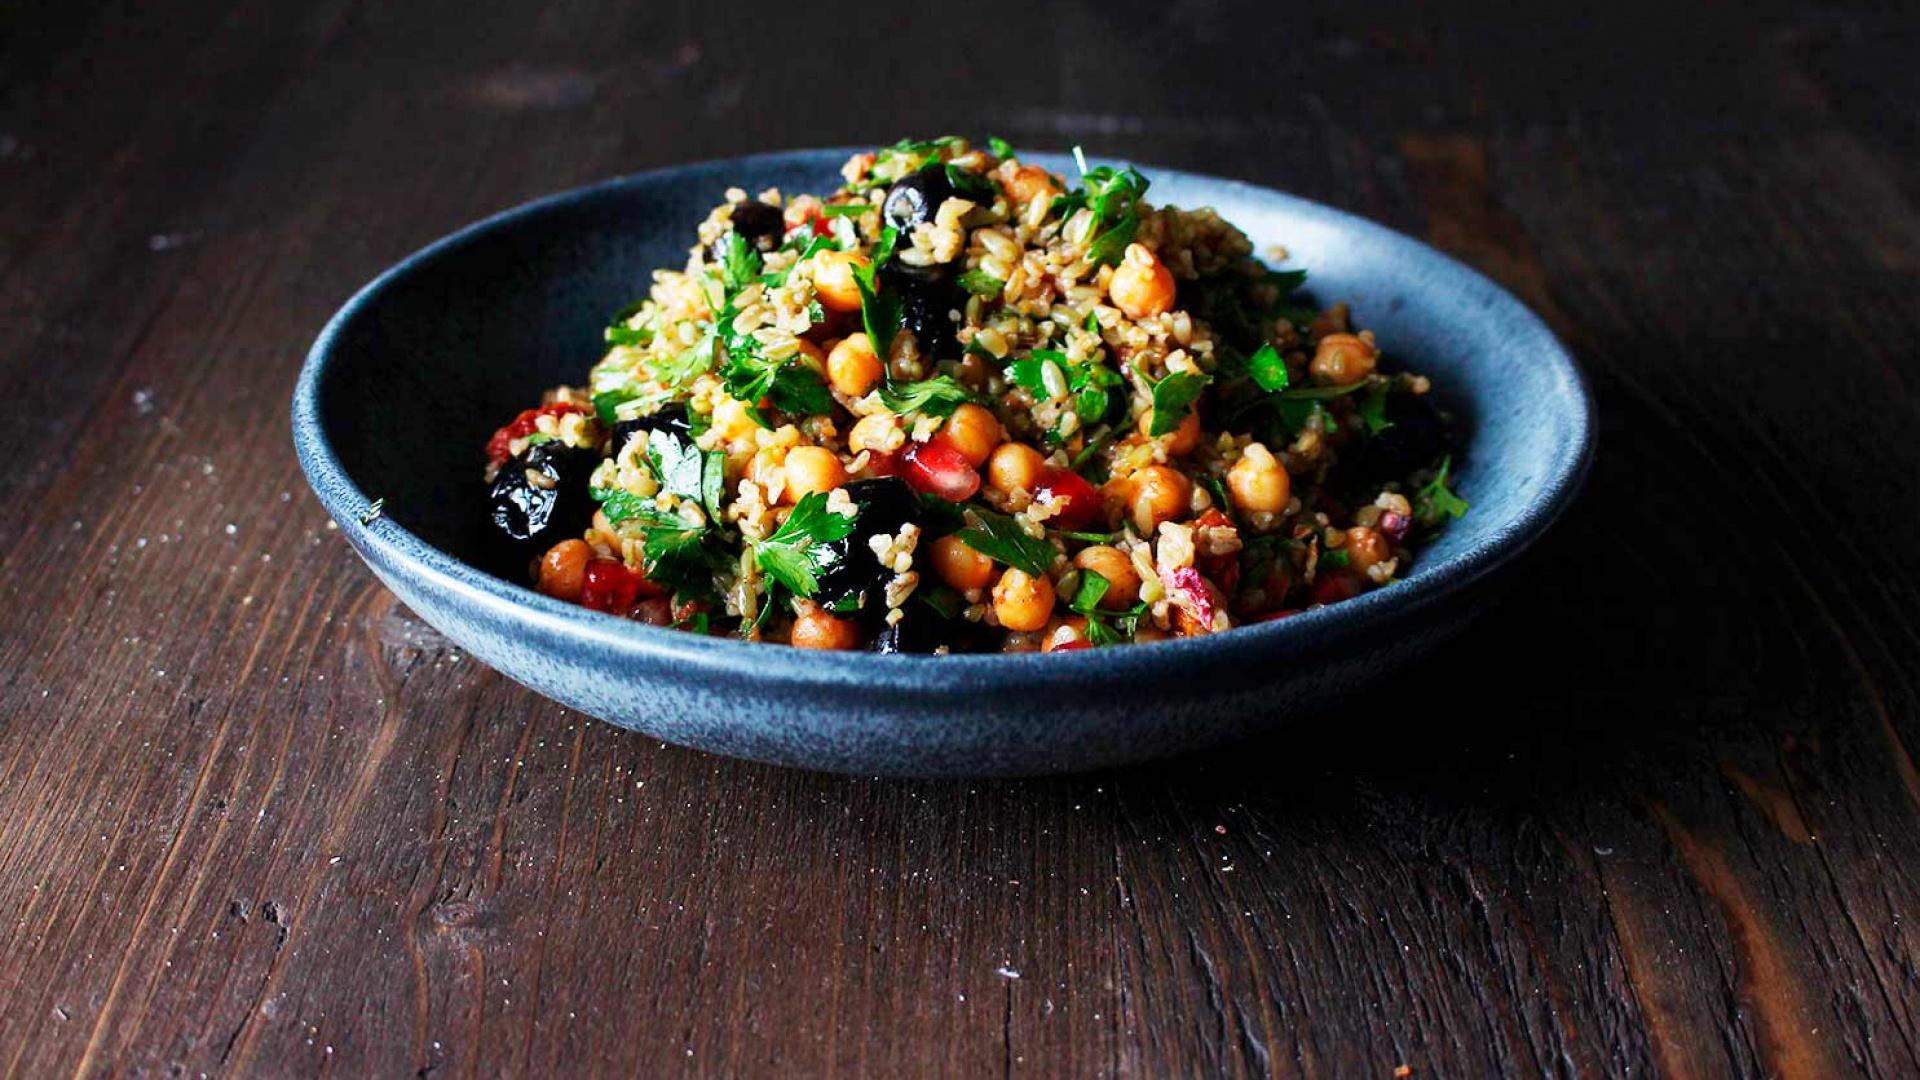 The Hampstead Kitchen's freekeh recipe